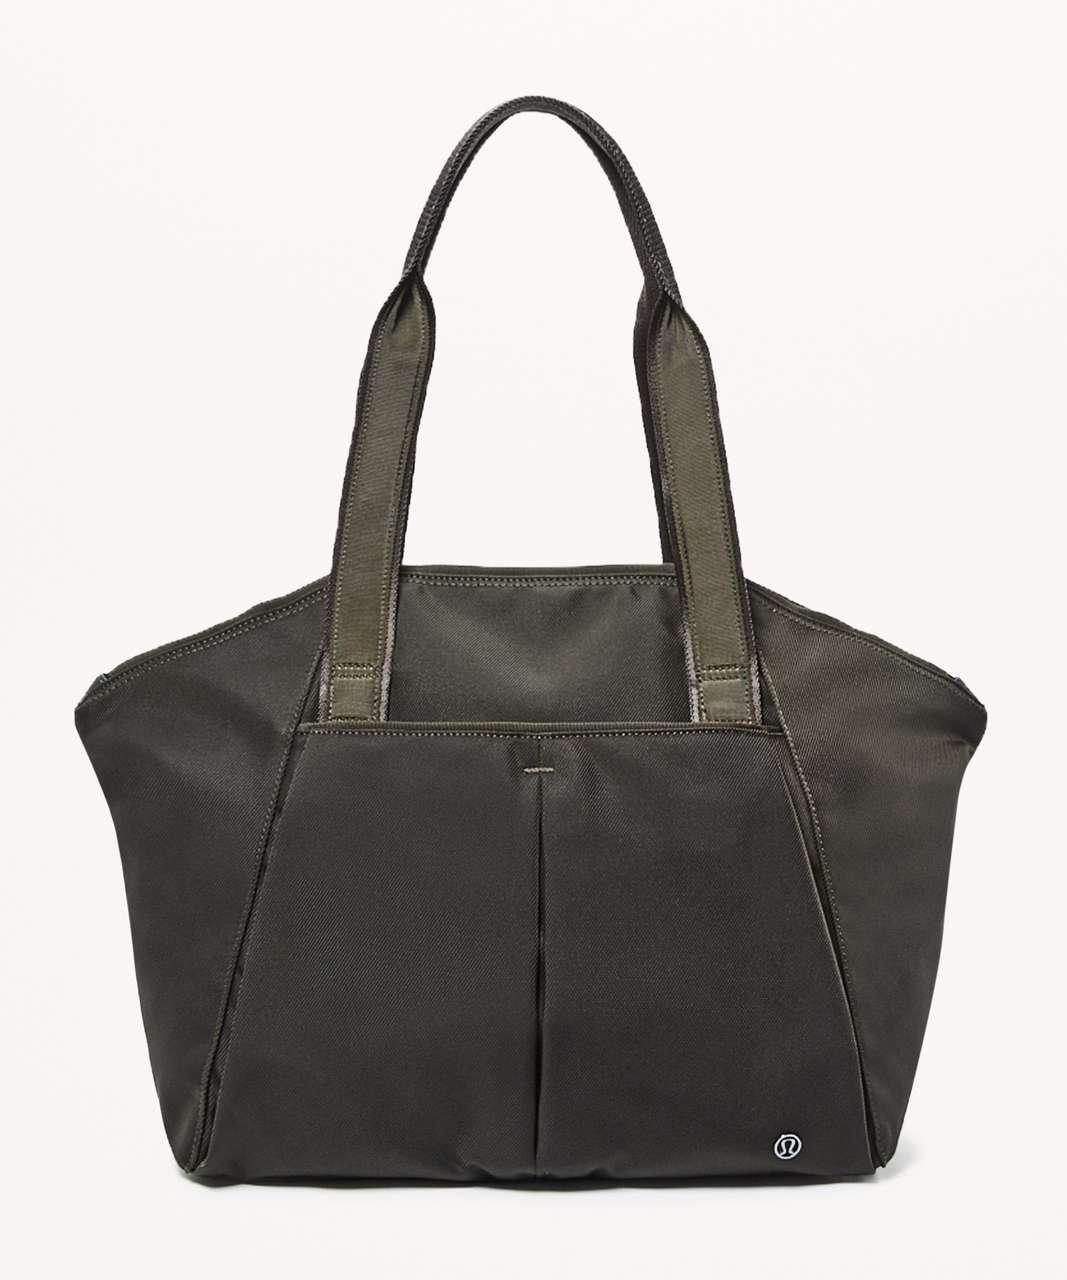 Lululemon Free To Be Bag - Dark Olive